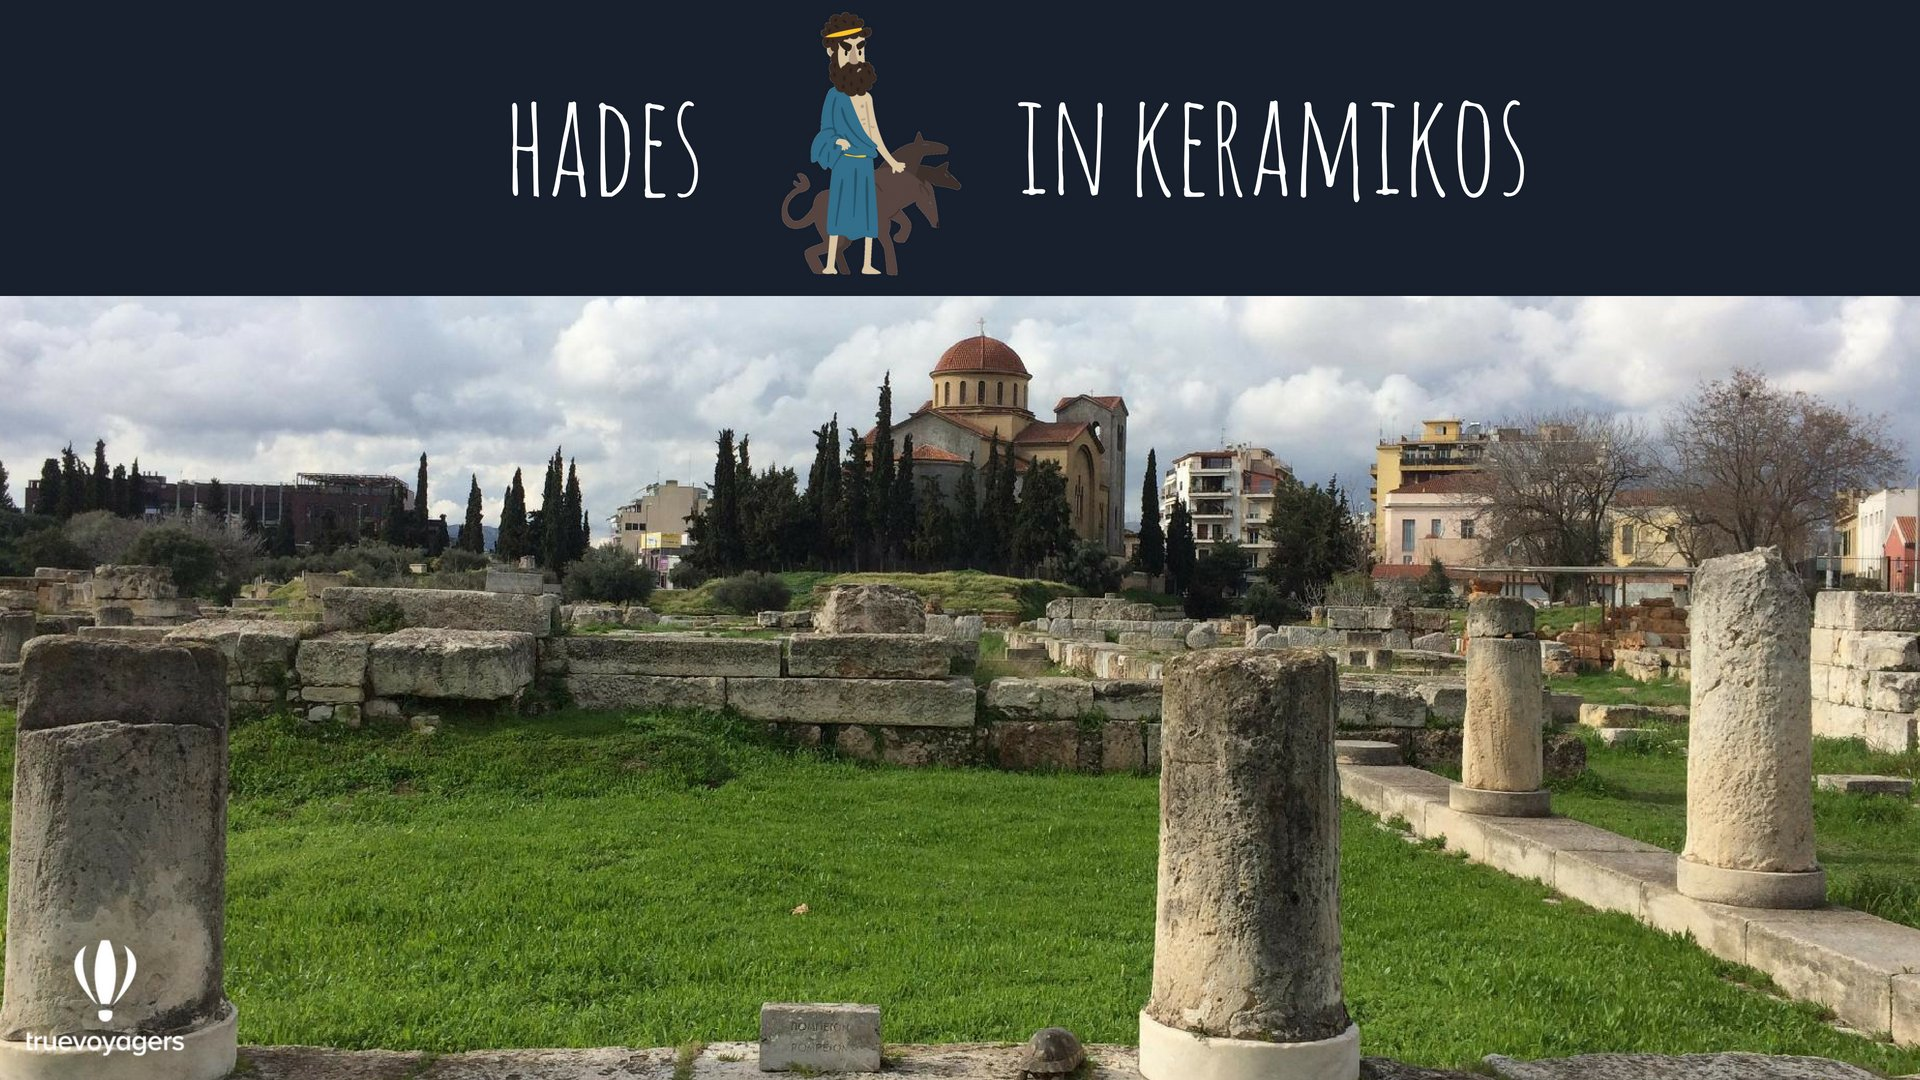 Hades in Keramikos. Copyright: Truevoyagers